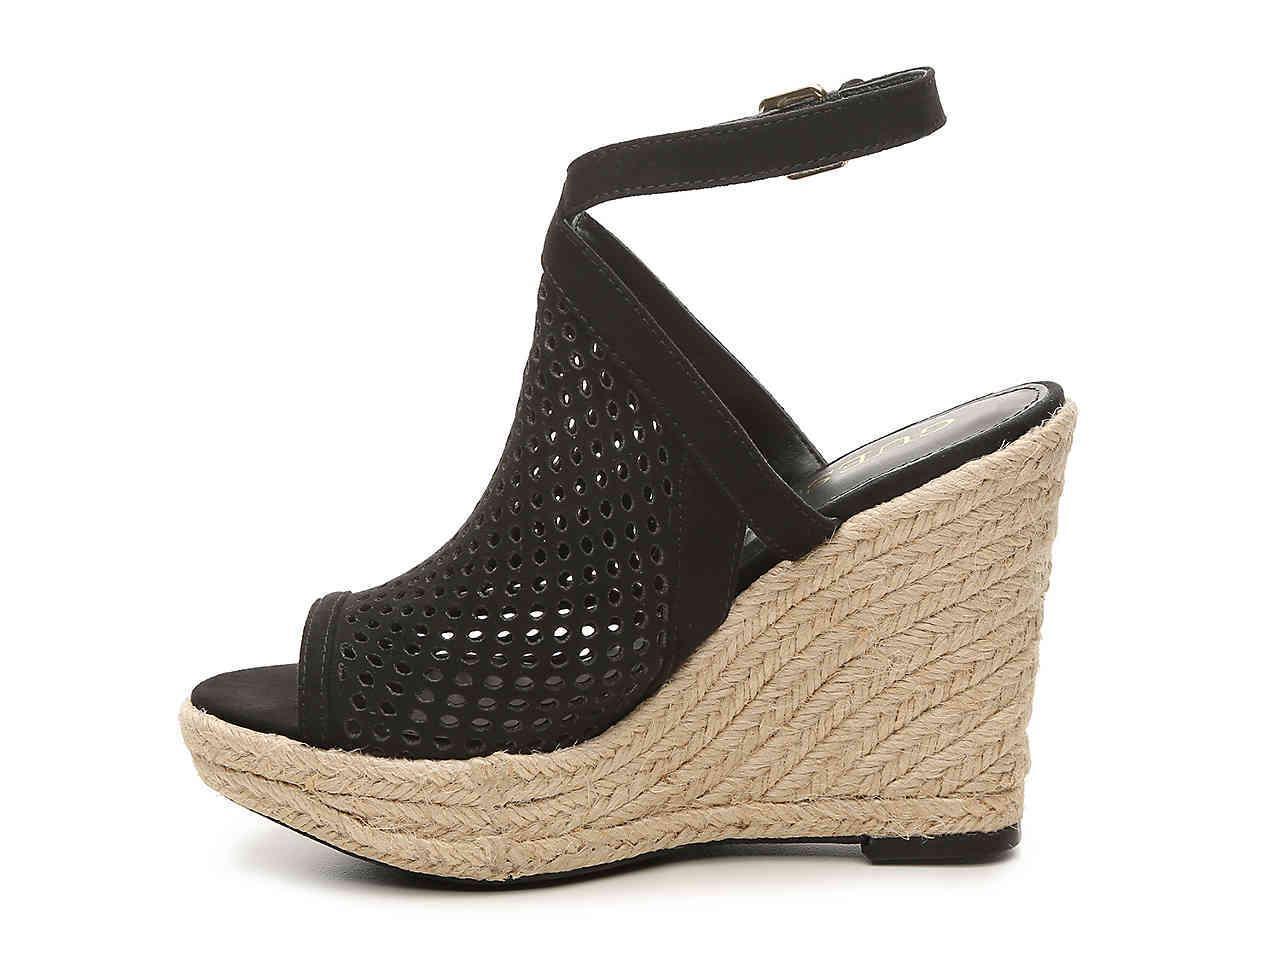 Guess nero Helida Helida Helida Wedge Platform Sandals donna Dimensione 7 M 73f111